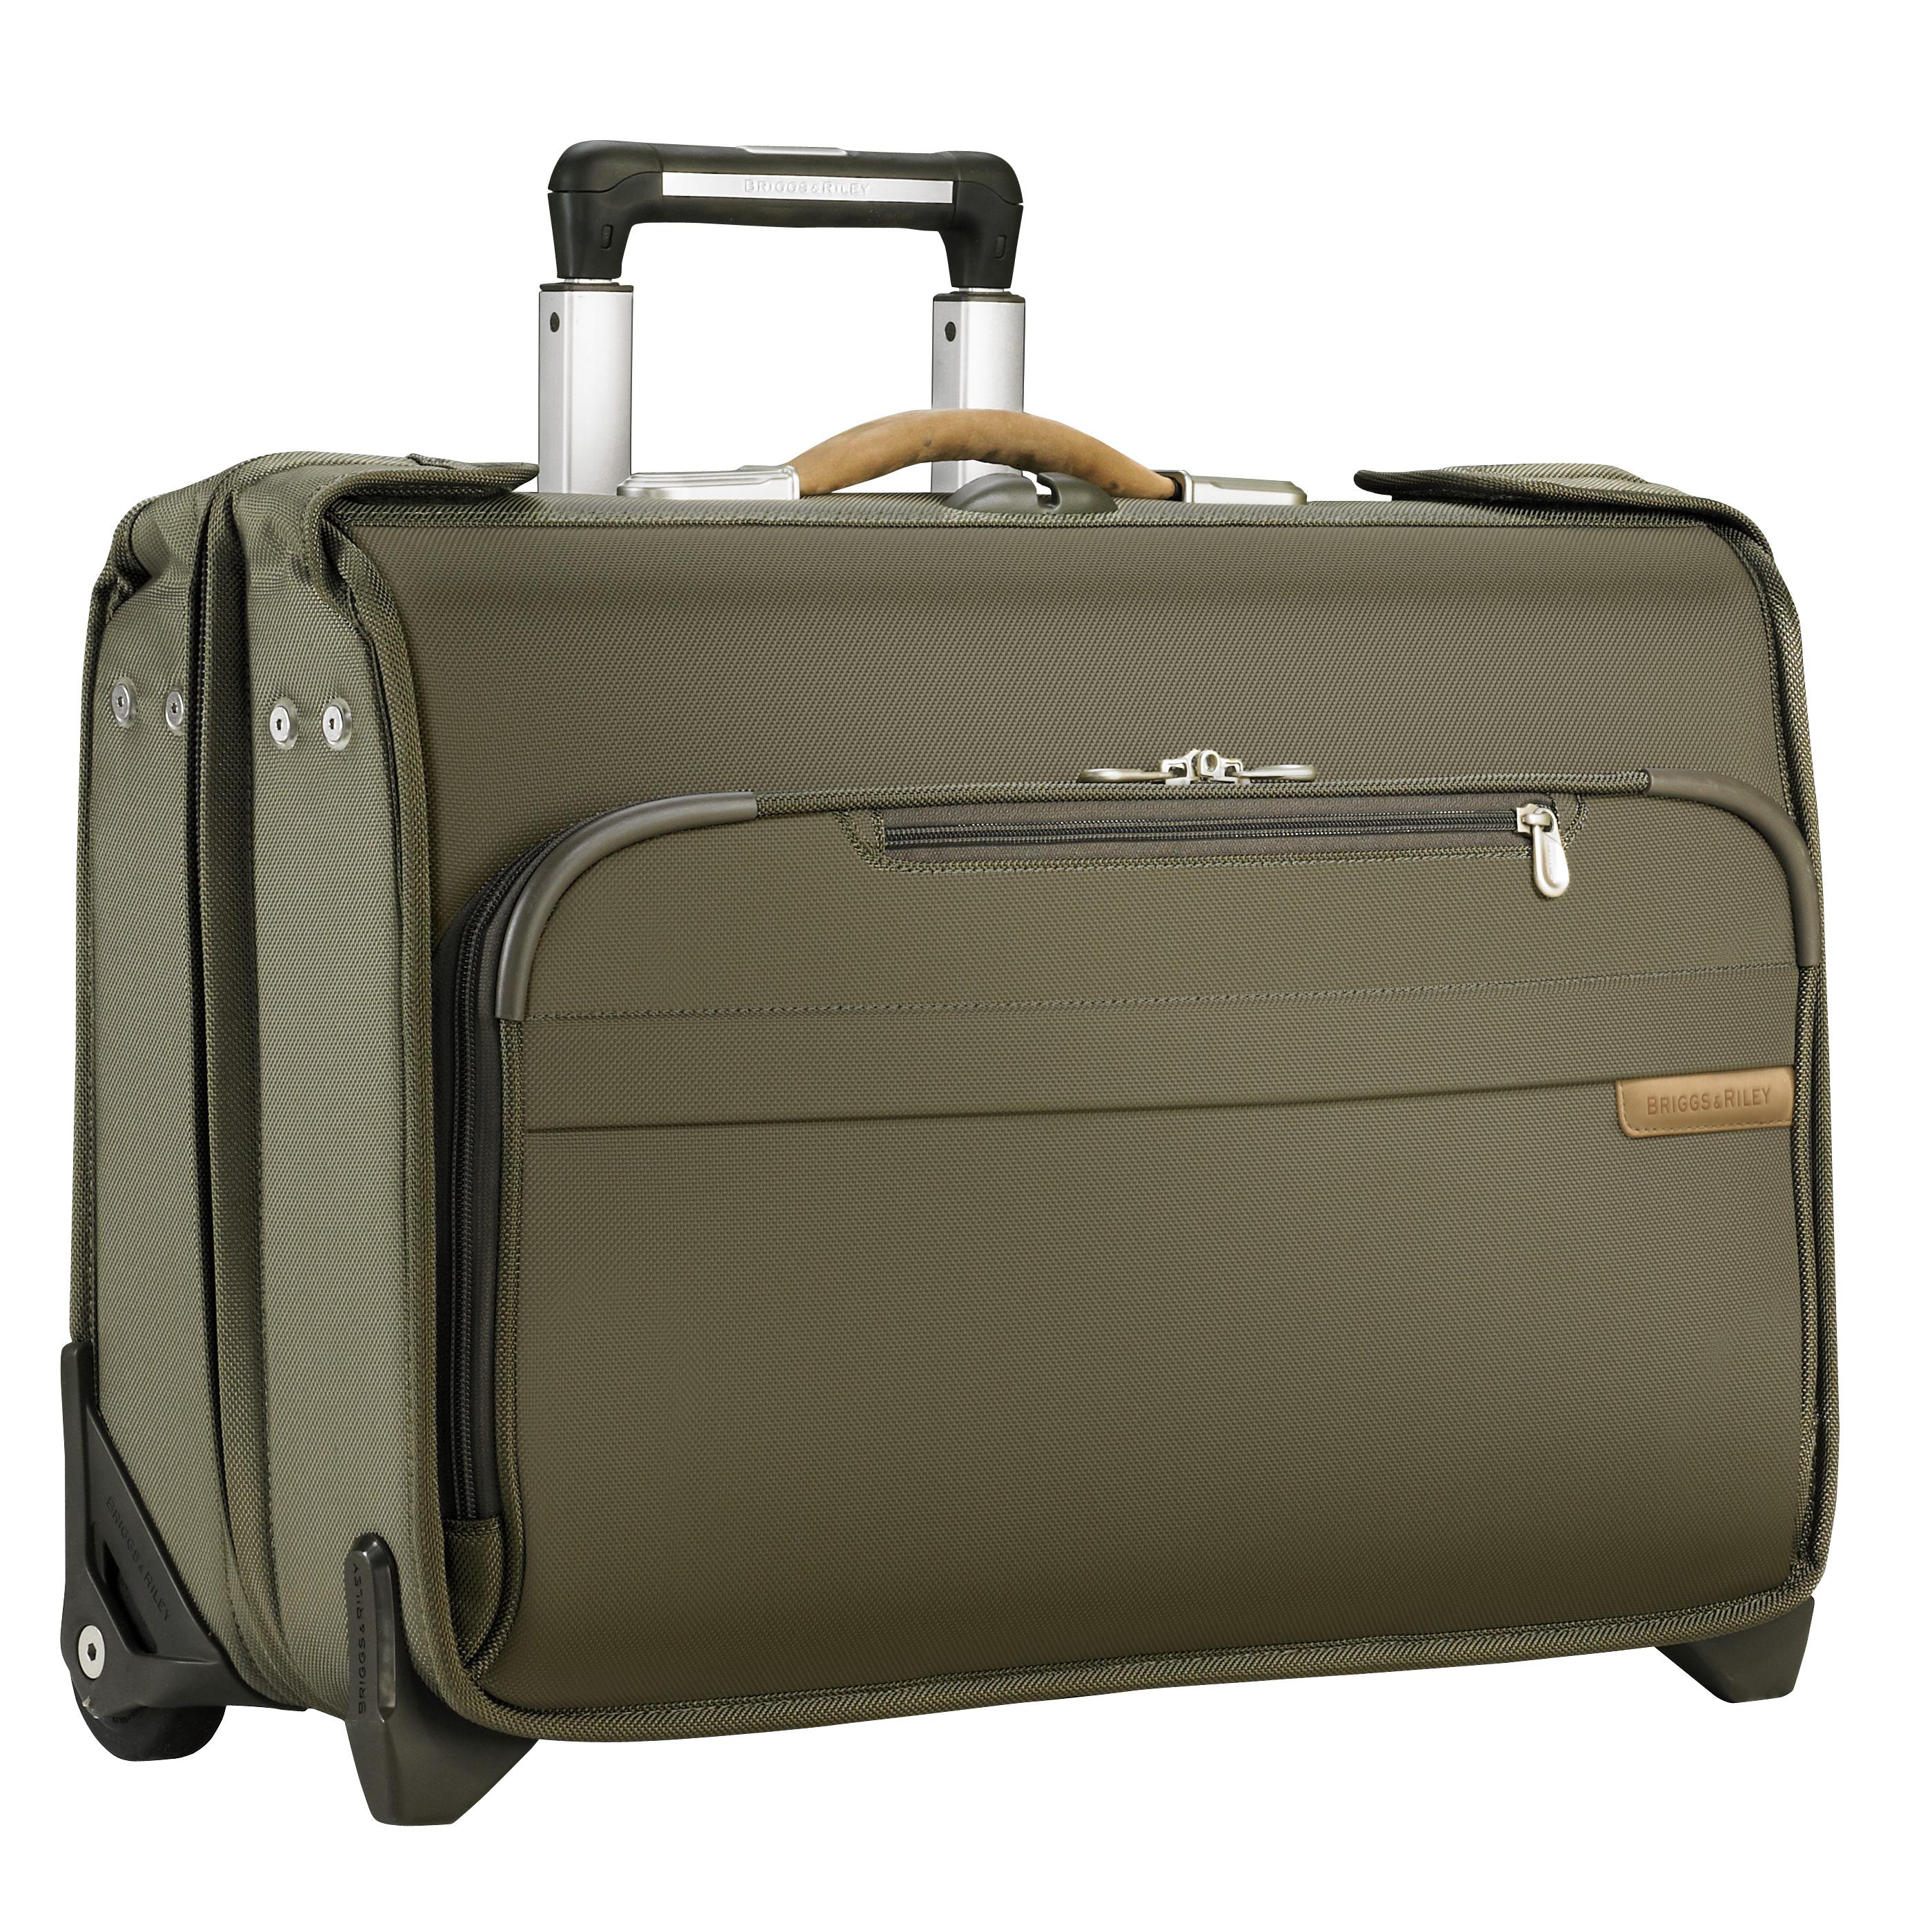 <b>Briggs &amp; Riley</b> Wheeled garment bag. $499; www.briggs-riley.com.